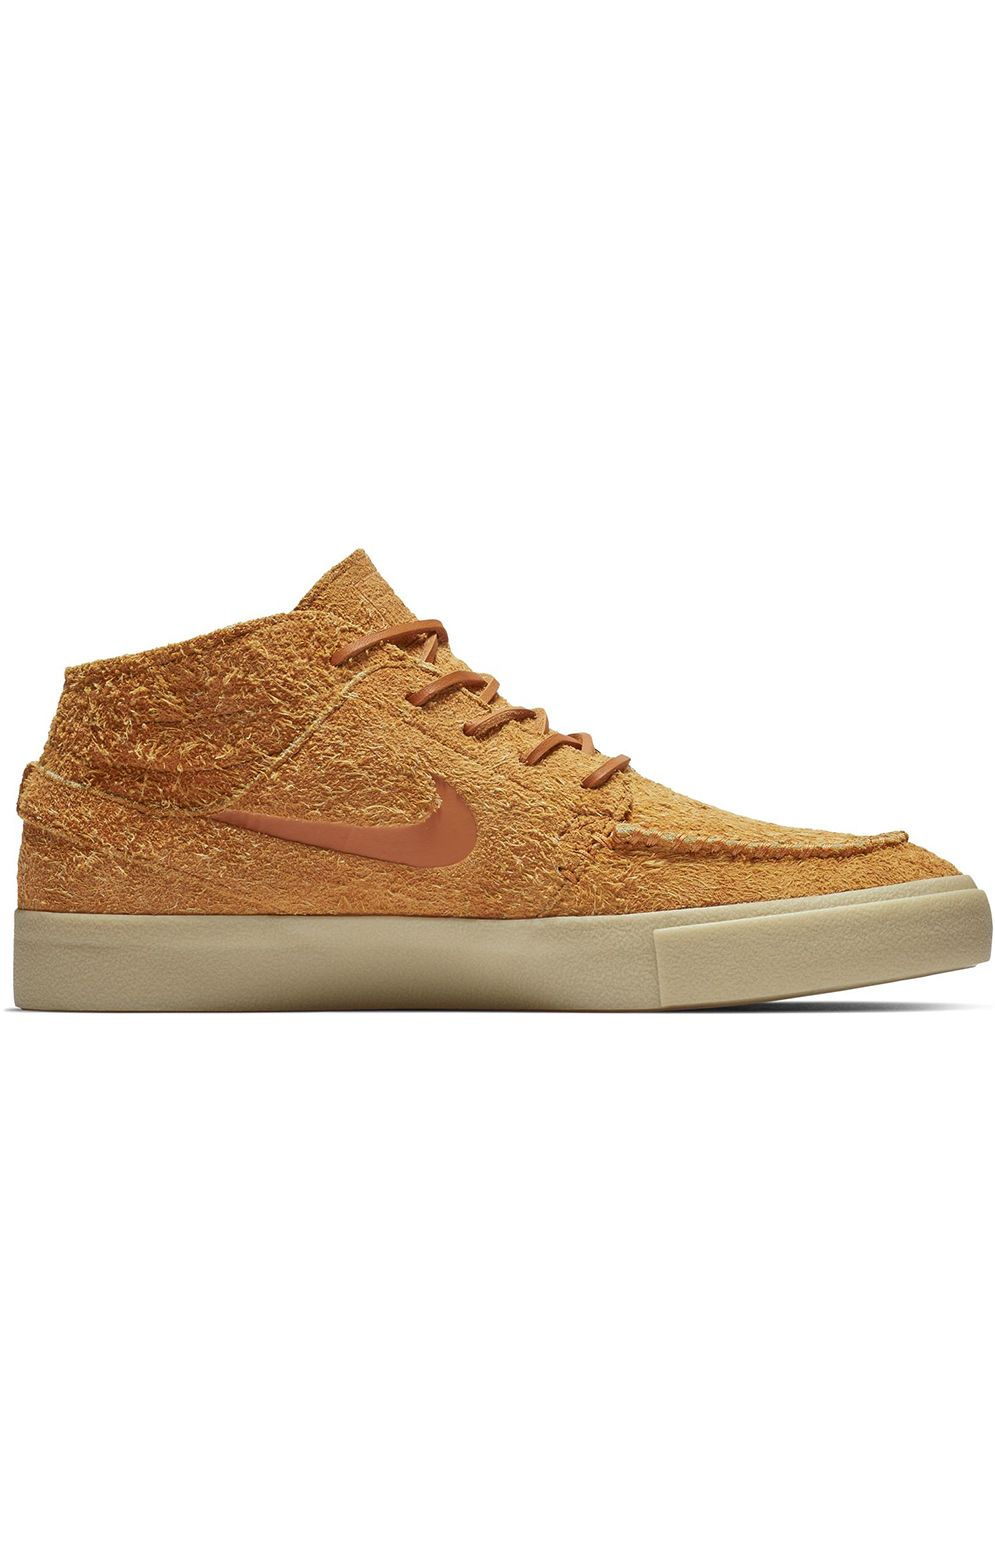 Nike Sb Shoes JANOSKI MID RM CRAFTED Cinder Orange/Cinder Orange-Team Gold-Team Crimson-Cinder Orange